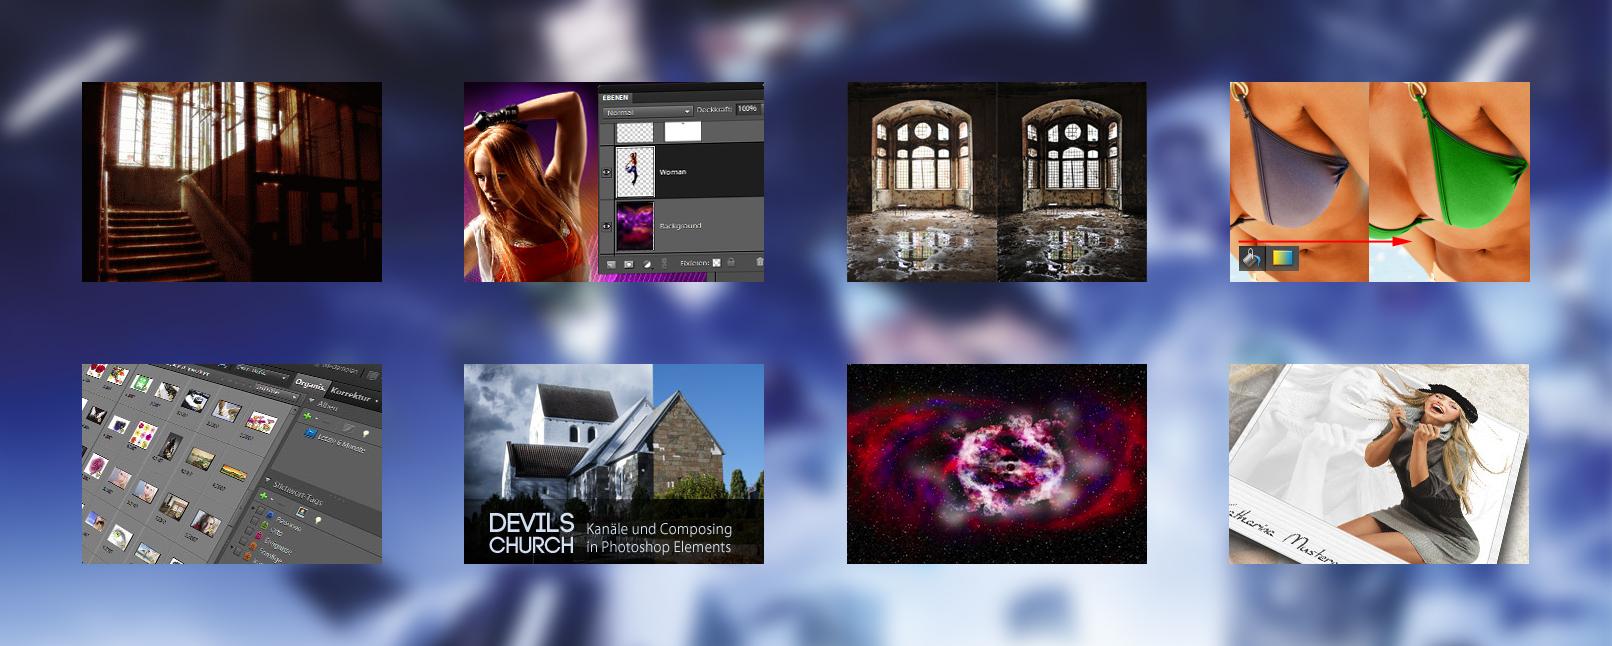 Photoshop Elements